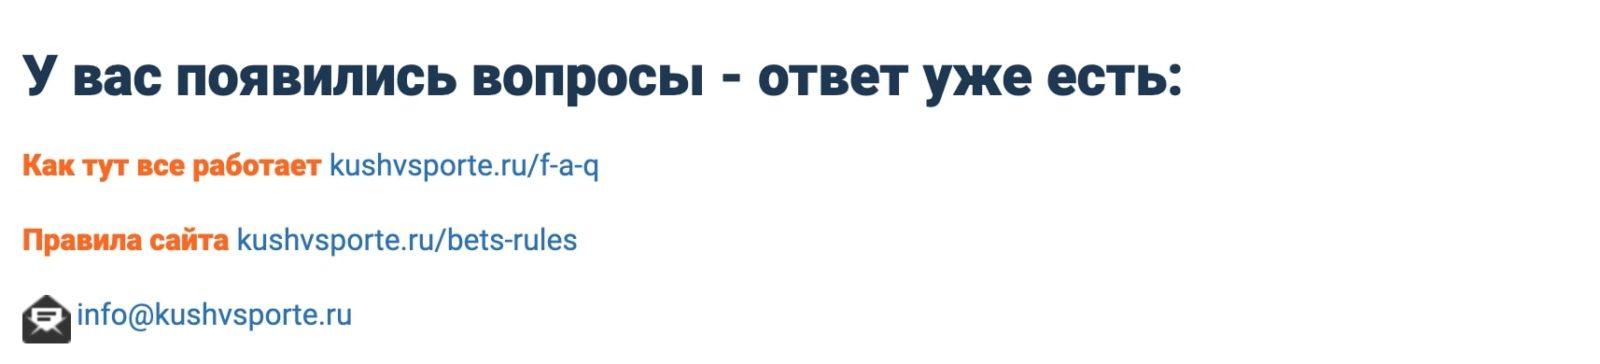 Обратная связь на сайта www kushvsporte ru (Куш в спорте ру)